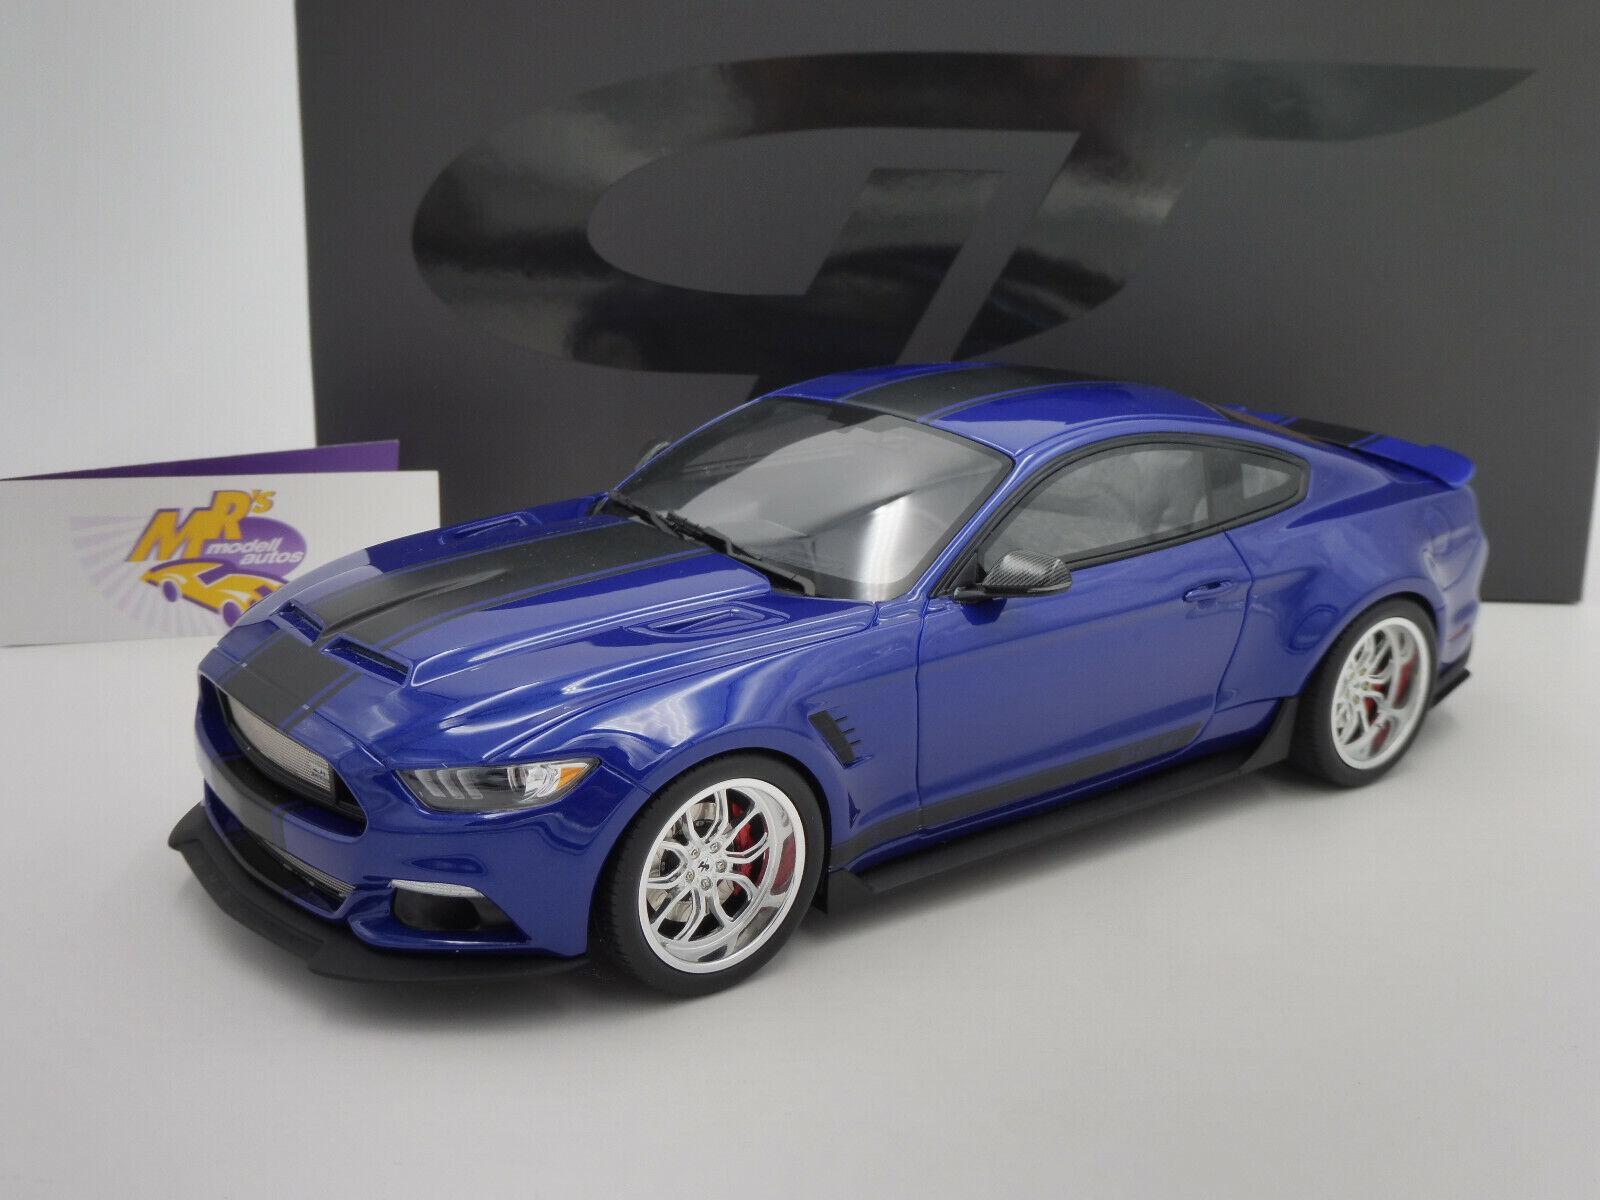 GT SPIRIT gt238   Ford Shelby gt-350 Widebody année modèle 2017  bleumetallic  1 18